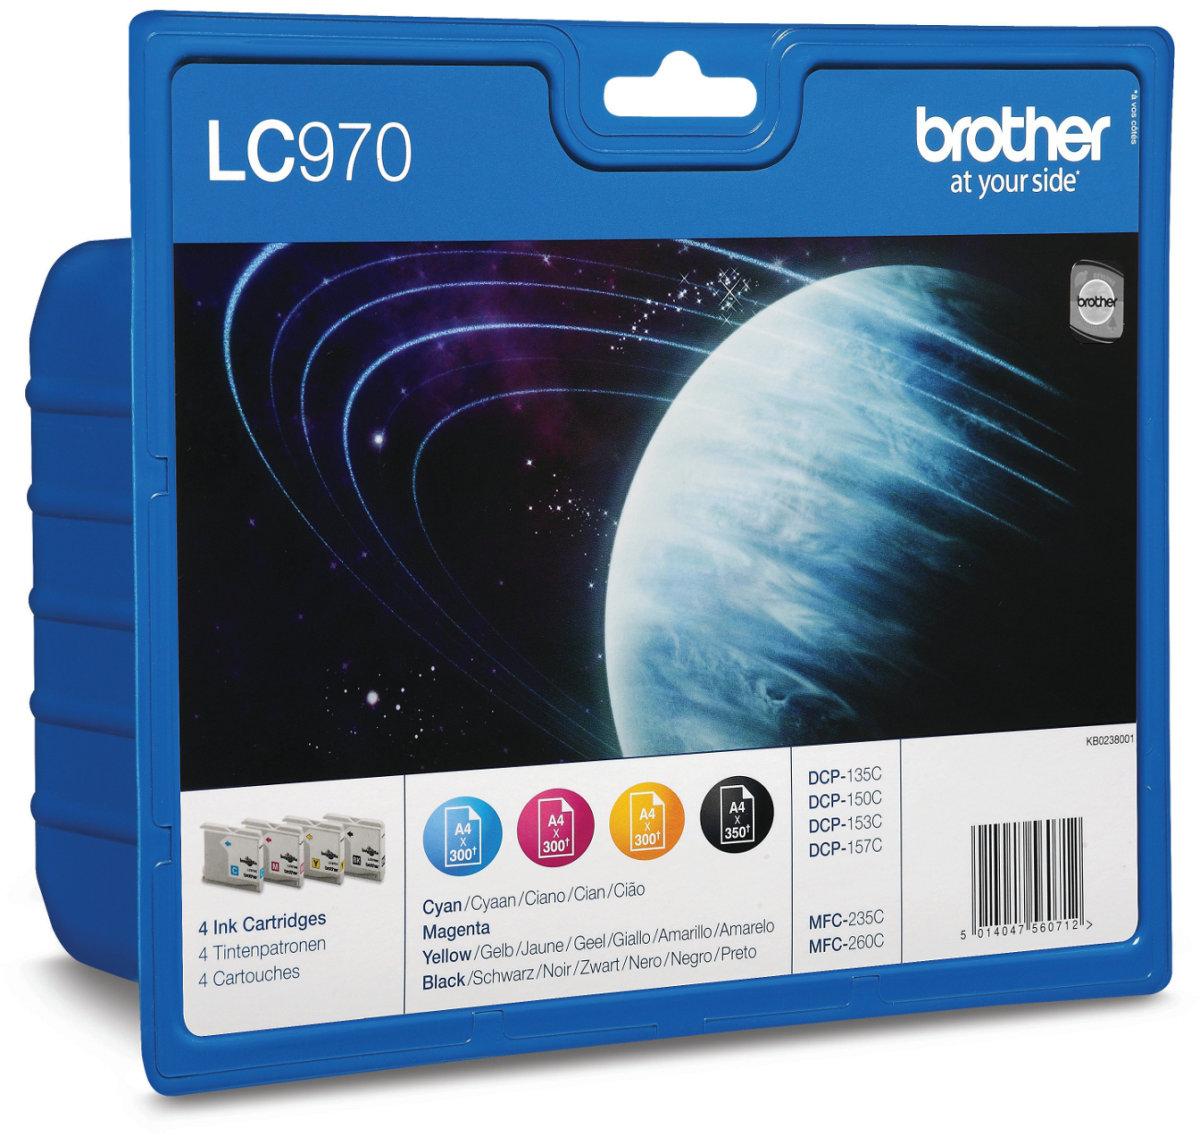 Brother LC970VALBPDR blækpatroner, sampak